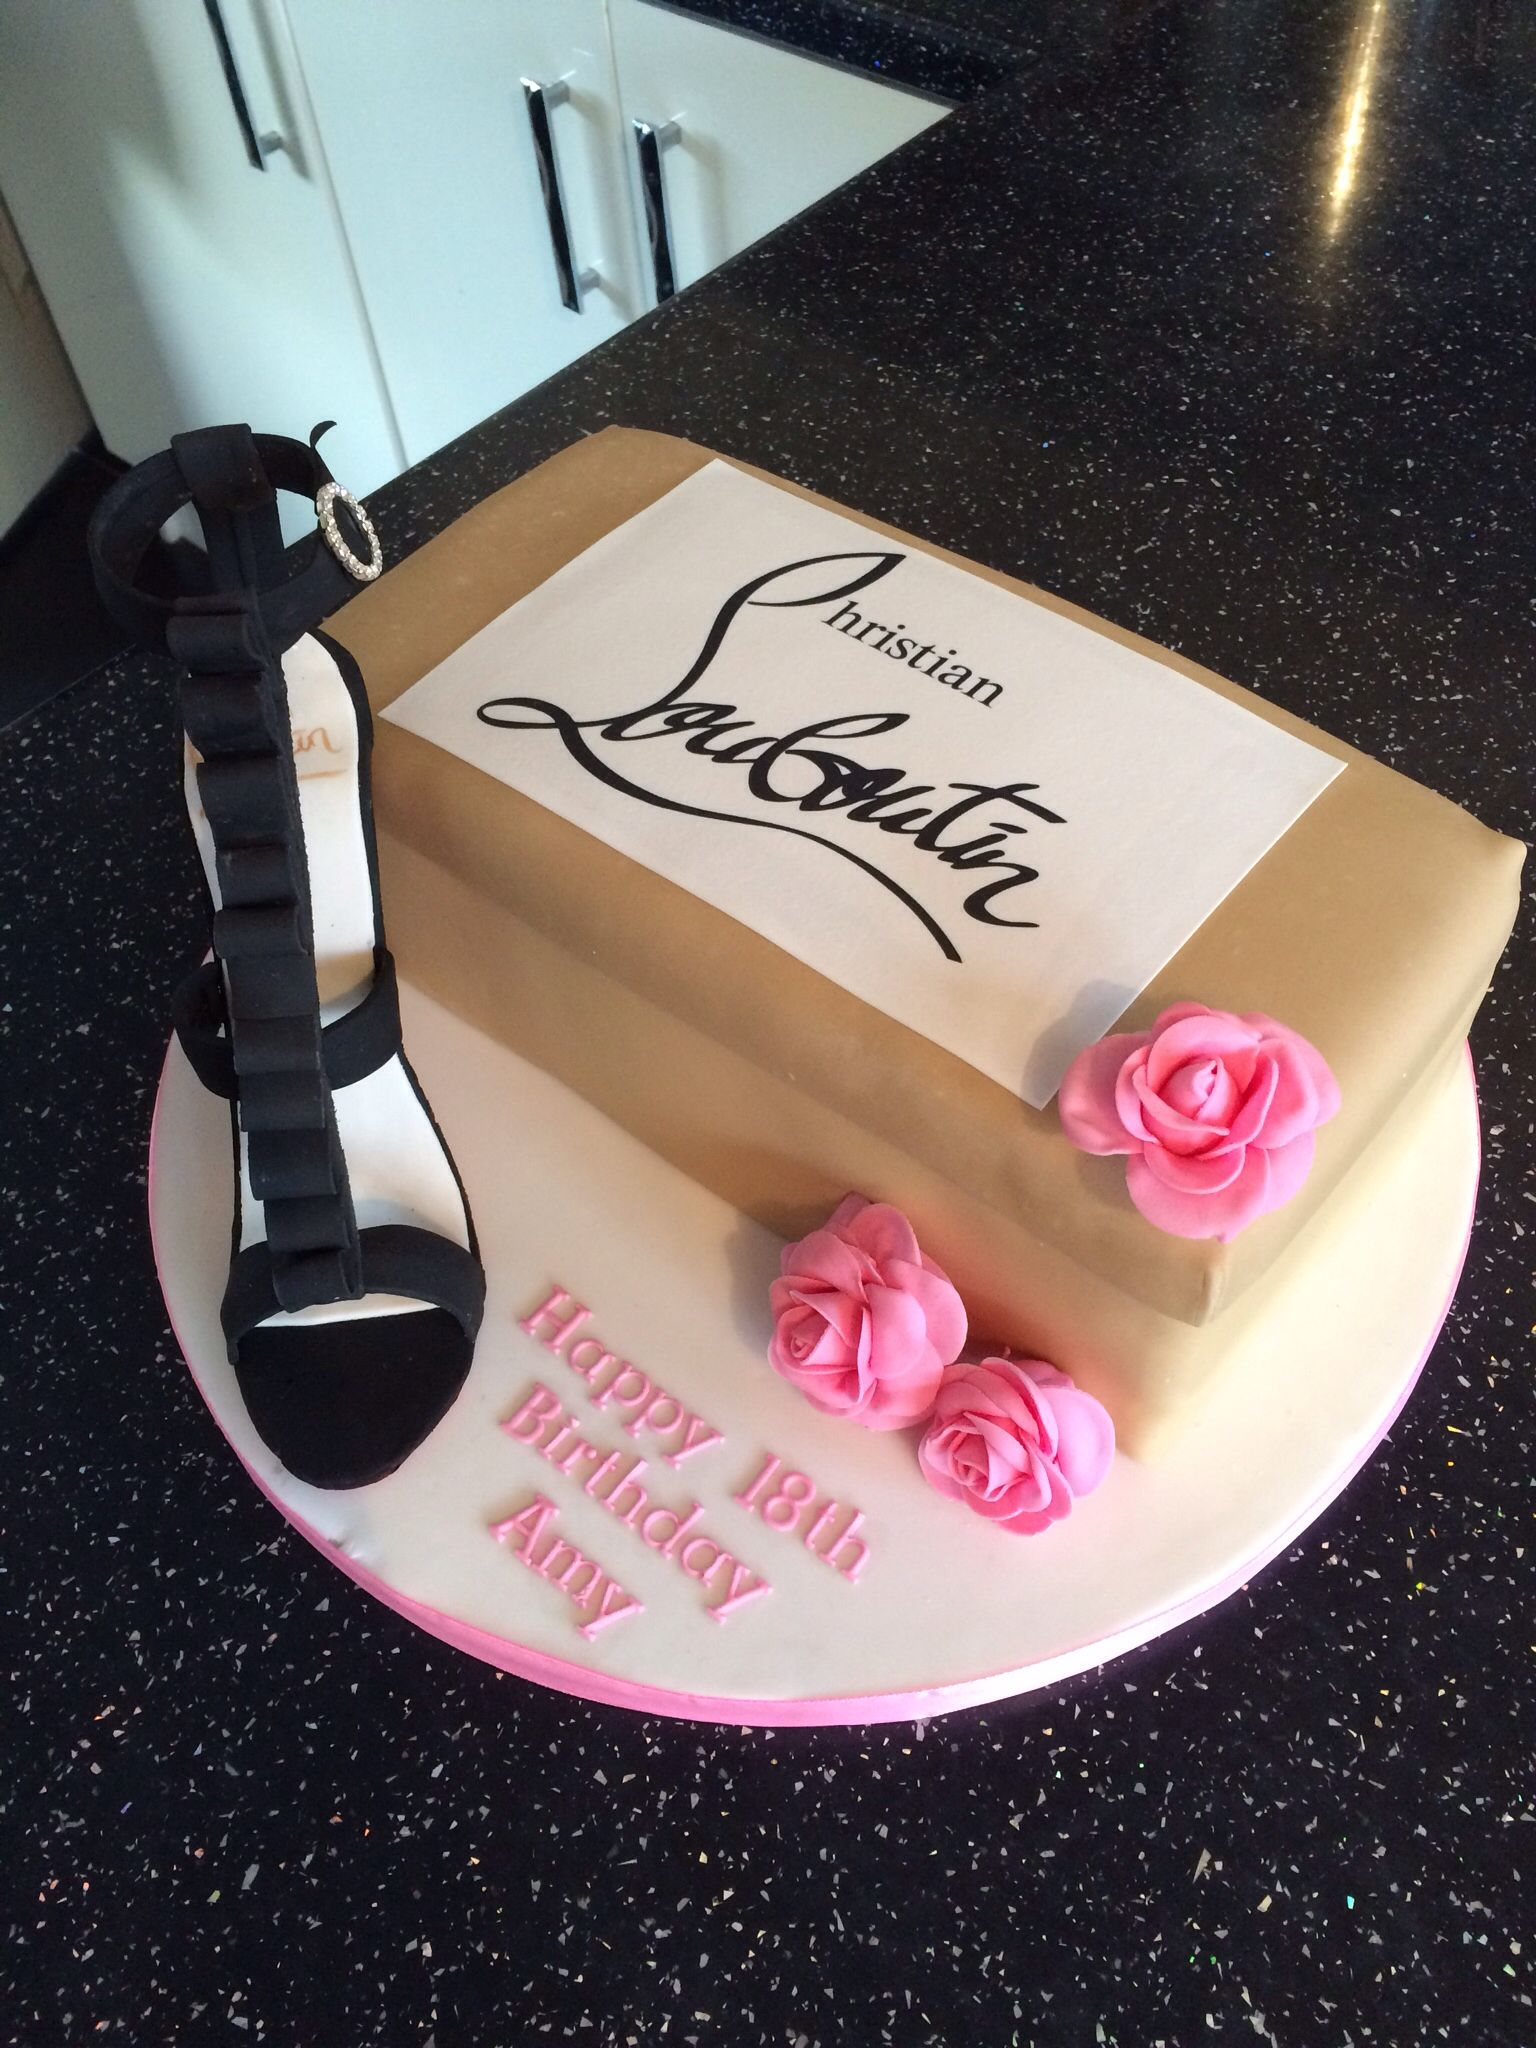 Christian Louboutin Shoe 18th birthday cake bday cake Pinterest